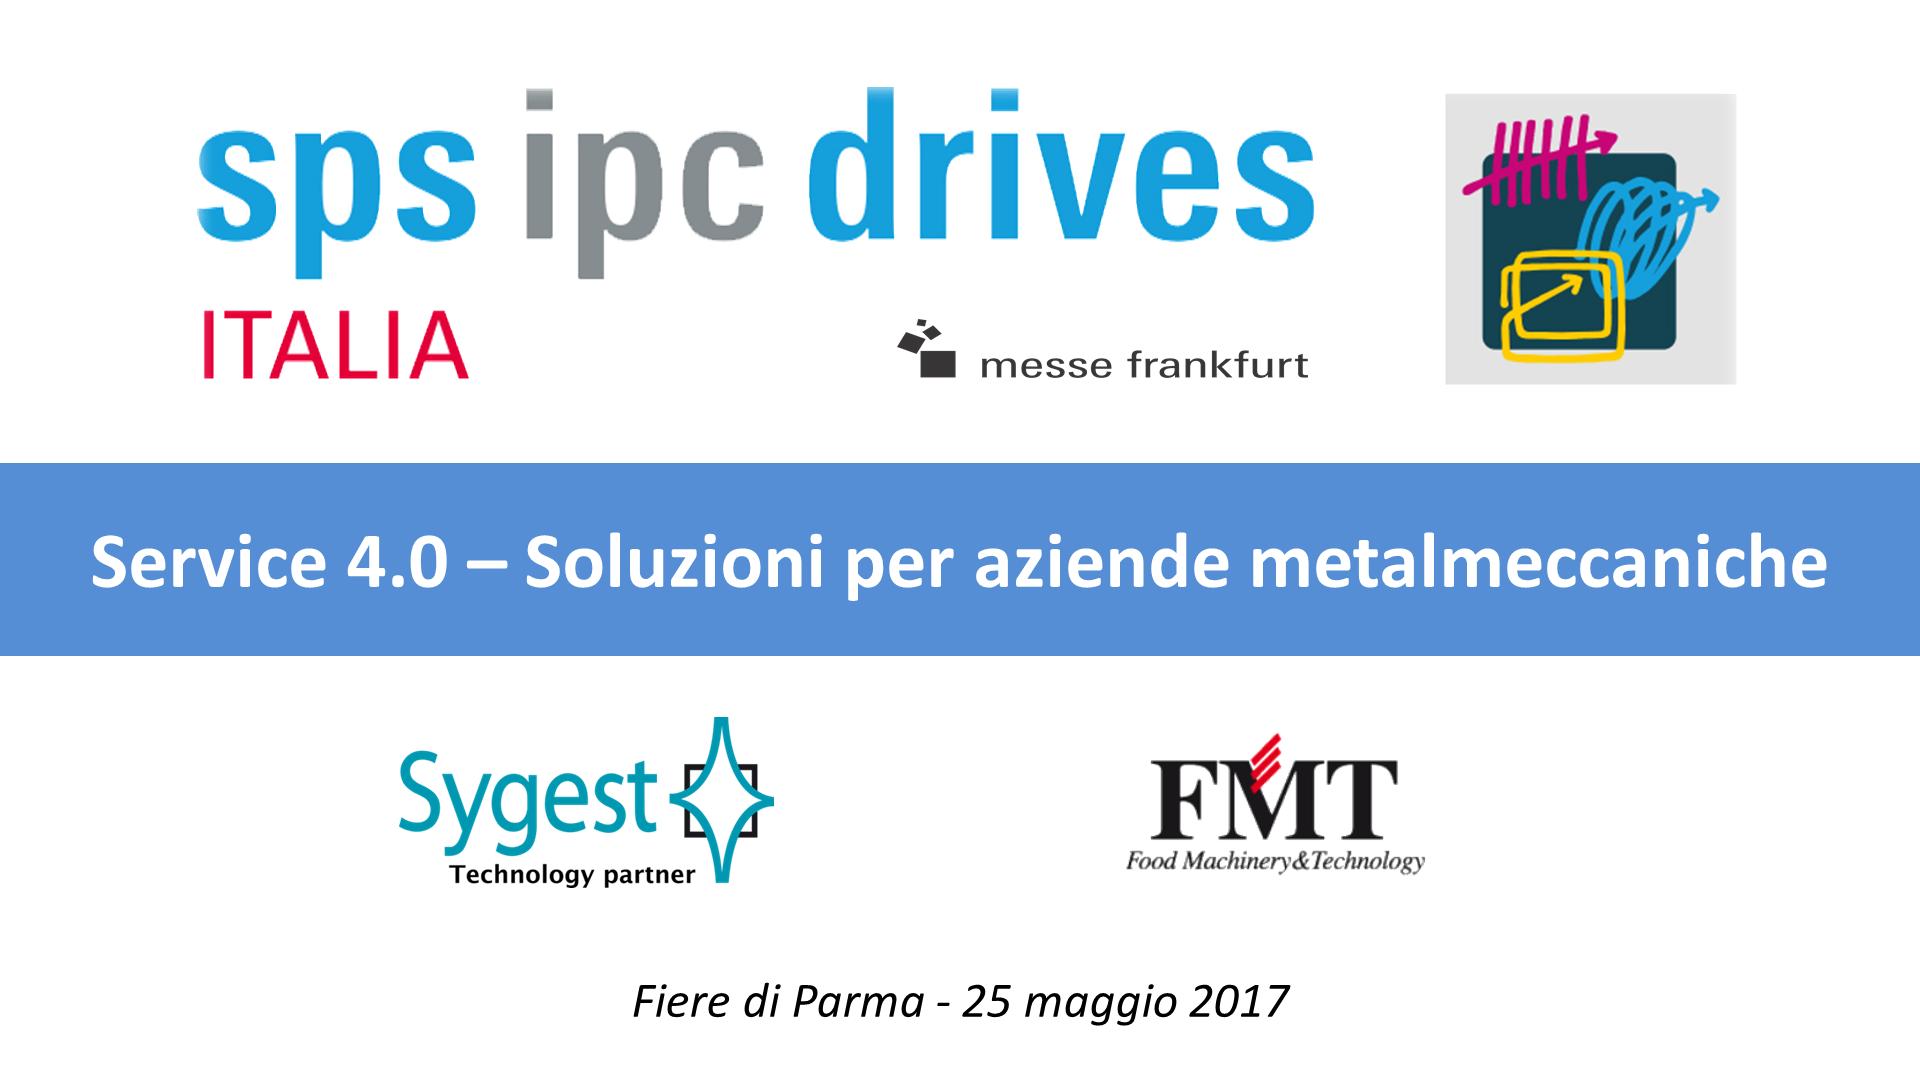 SPS 2017 - Service 4.0 | Sygest - FMT